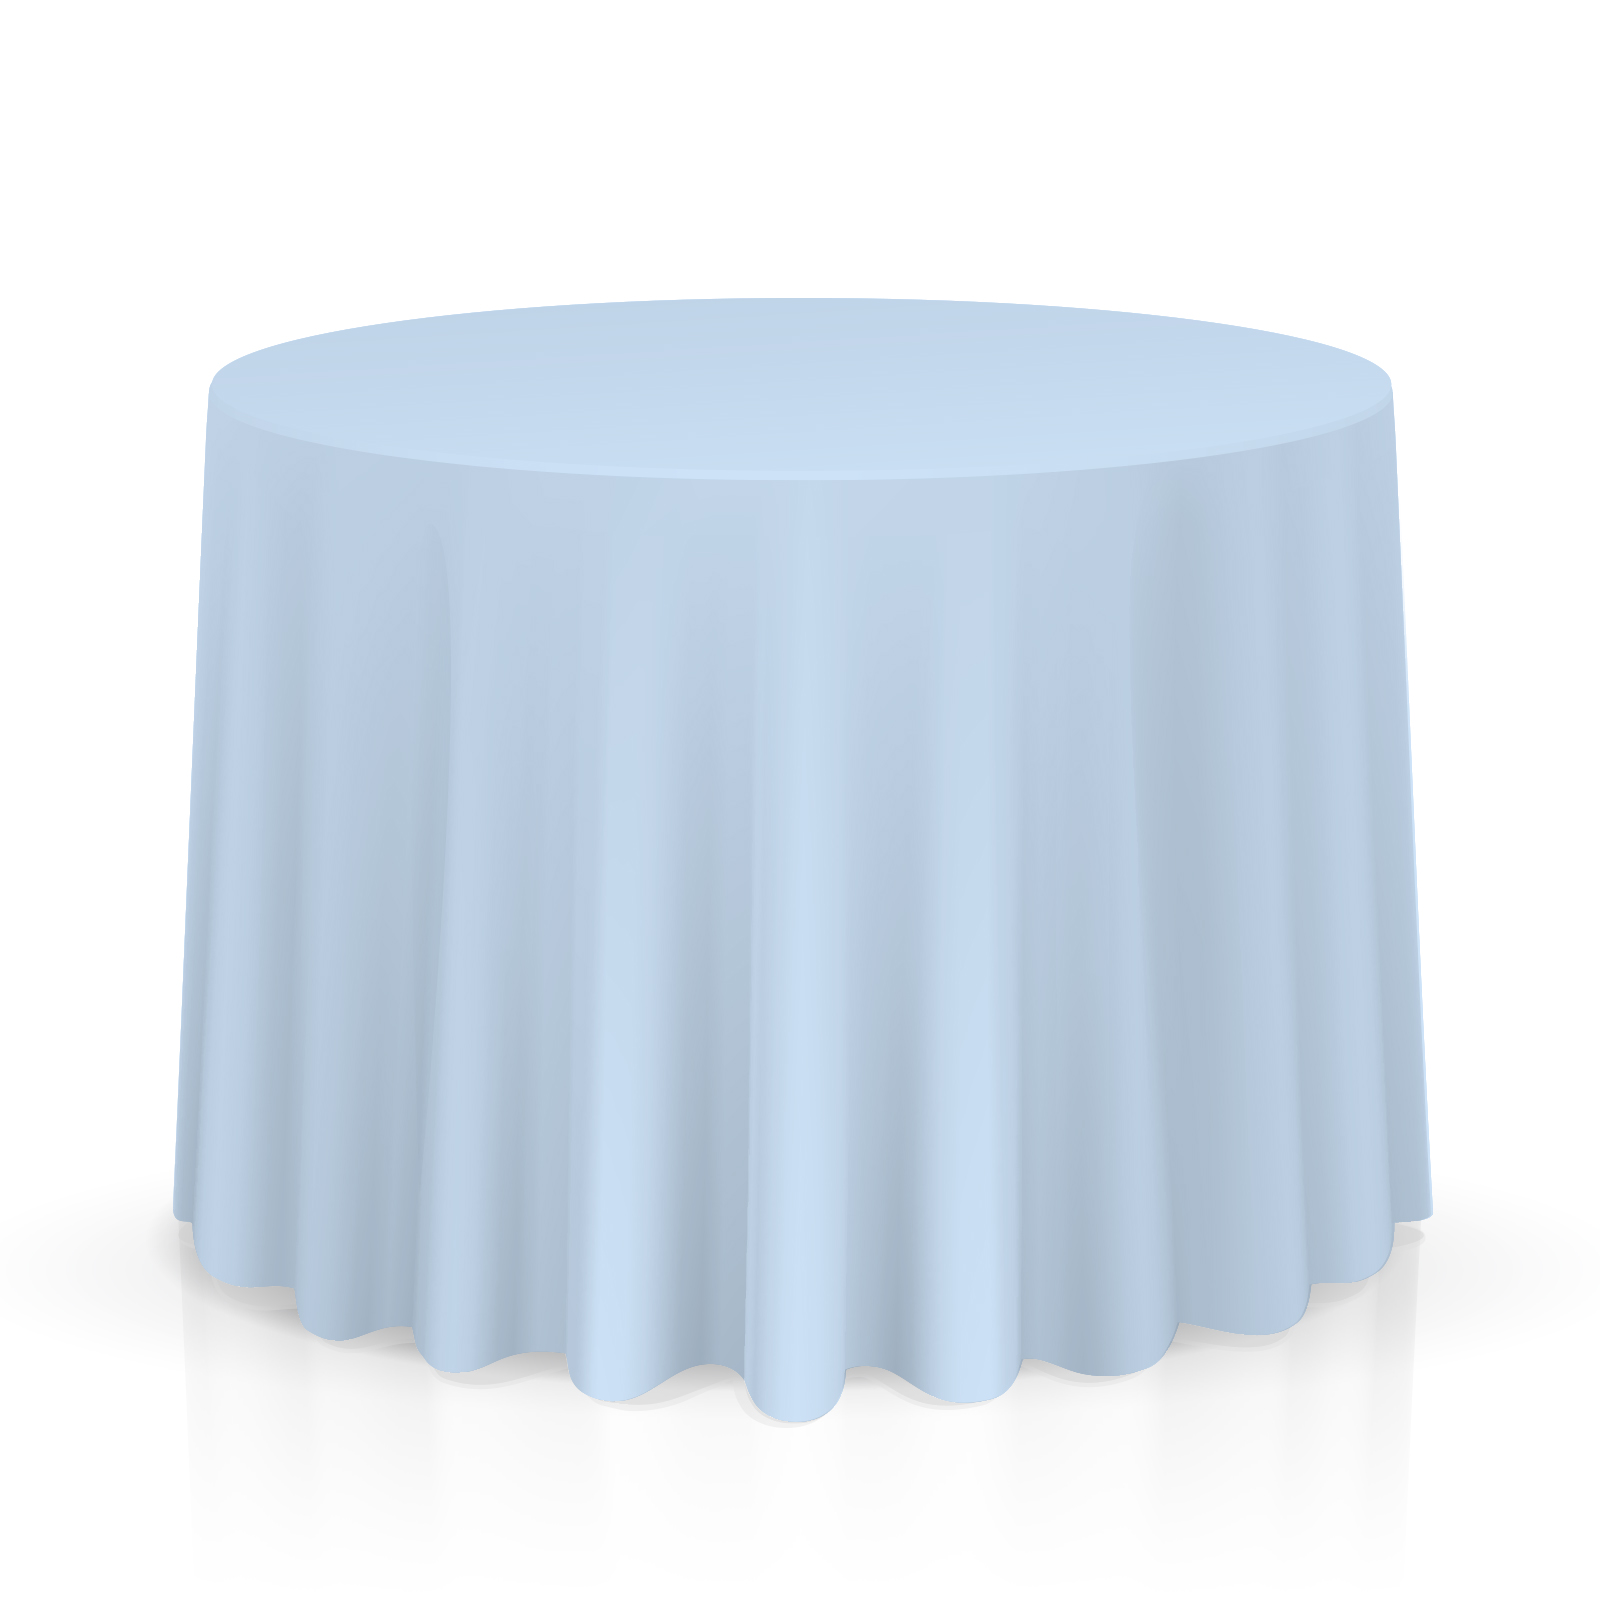 Lann's Linens Round Premium Tablecloth for Wedding   Banquet   Restaurant Polyester Fabric... by Lann's Linens